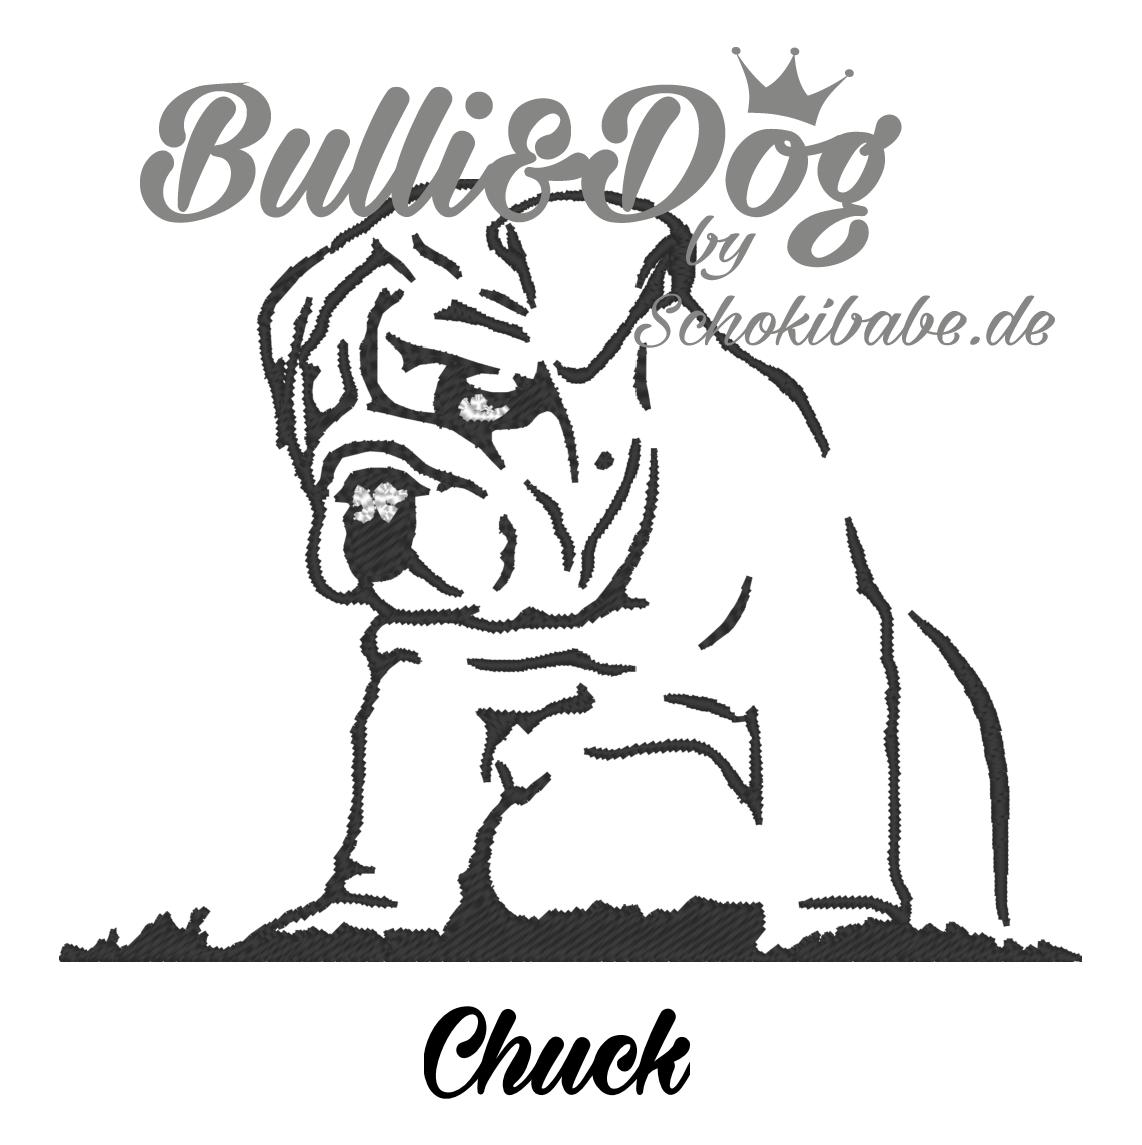 Chuck_10x10-Kopie